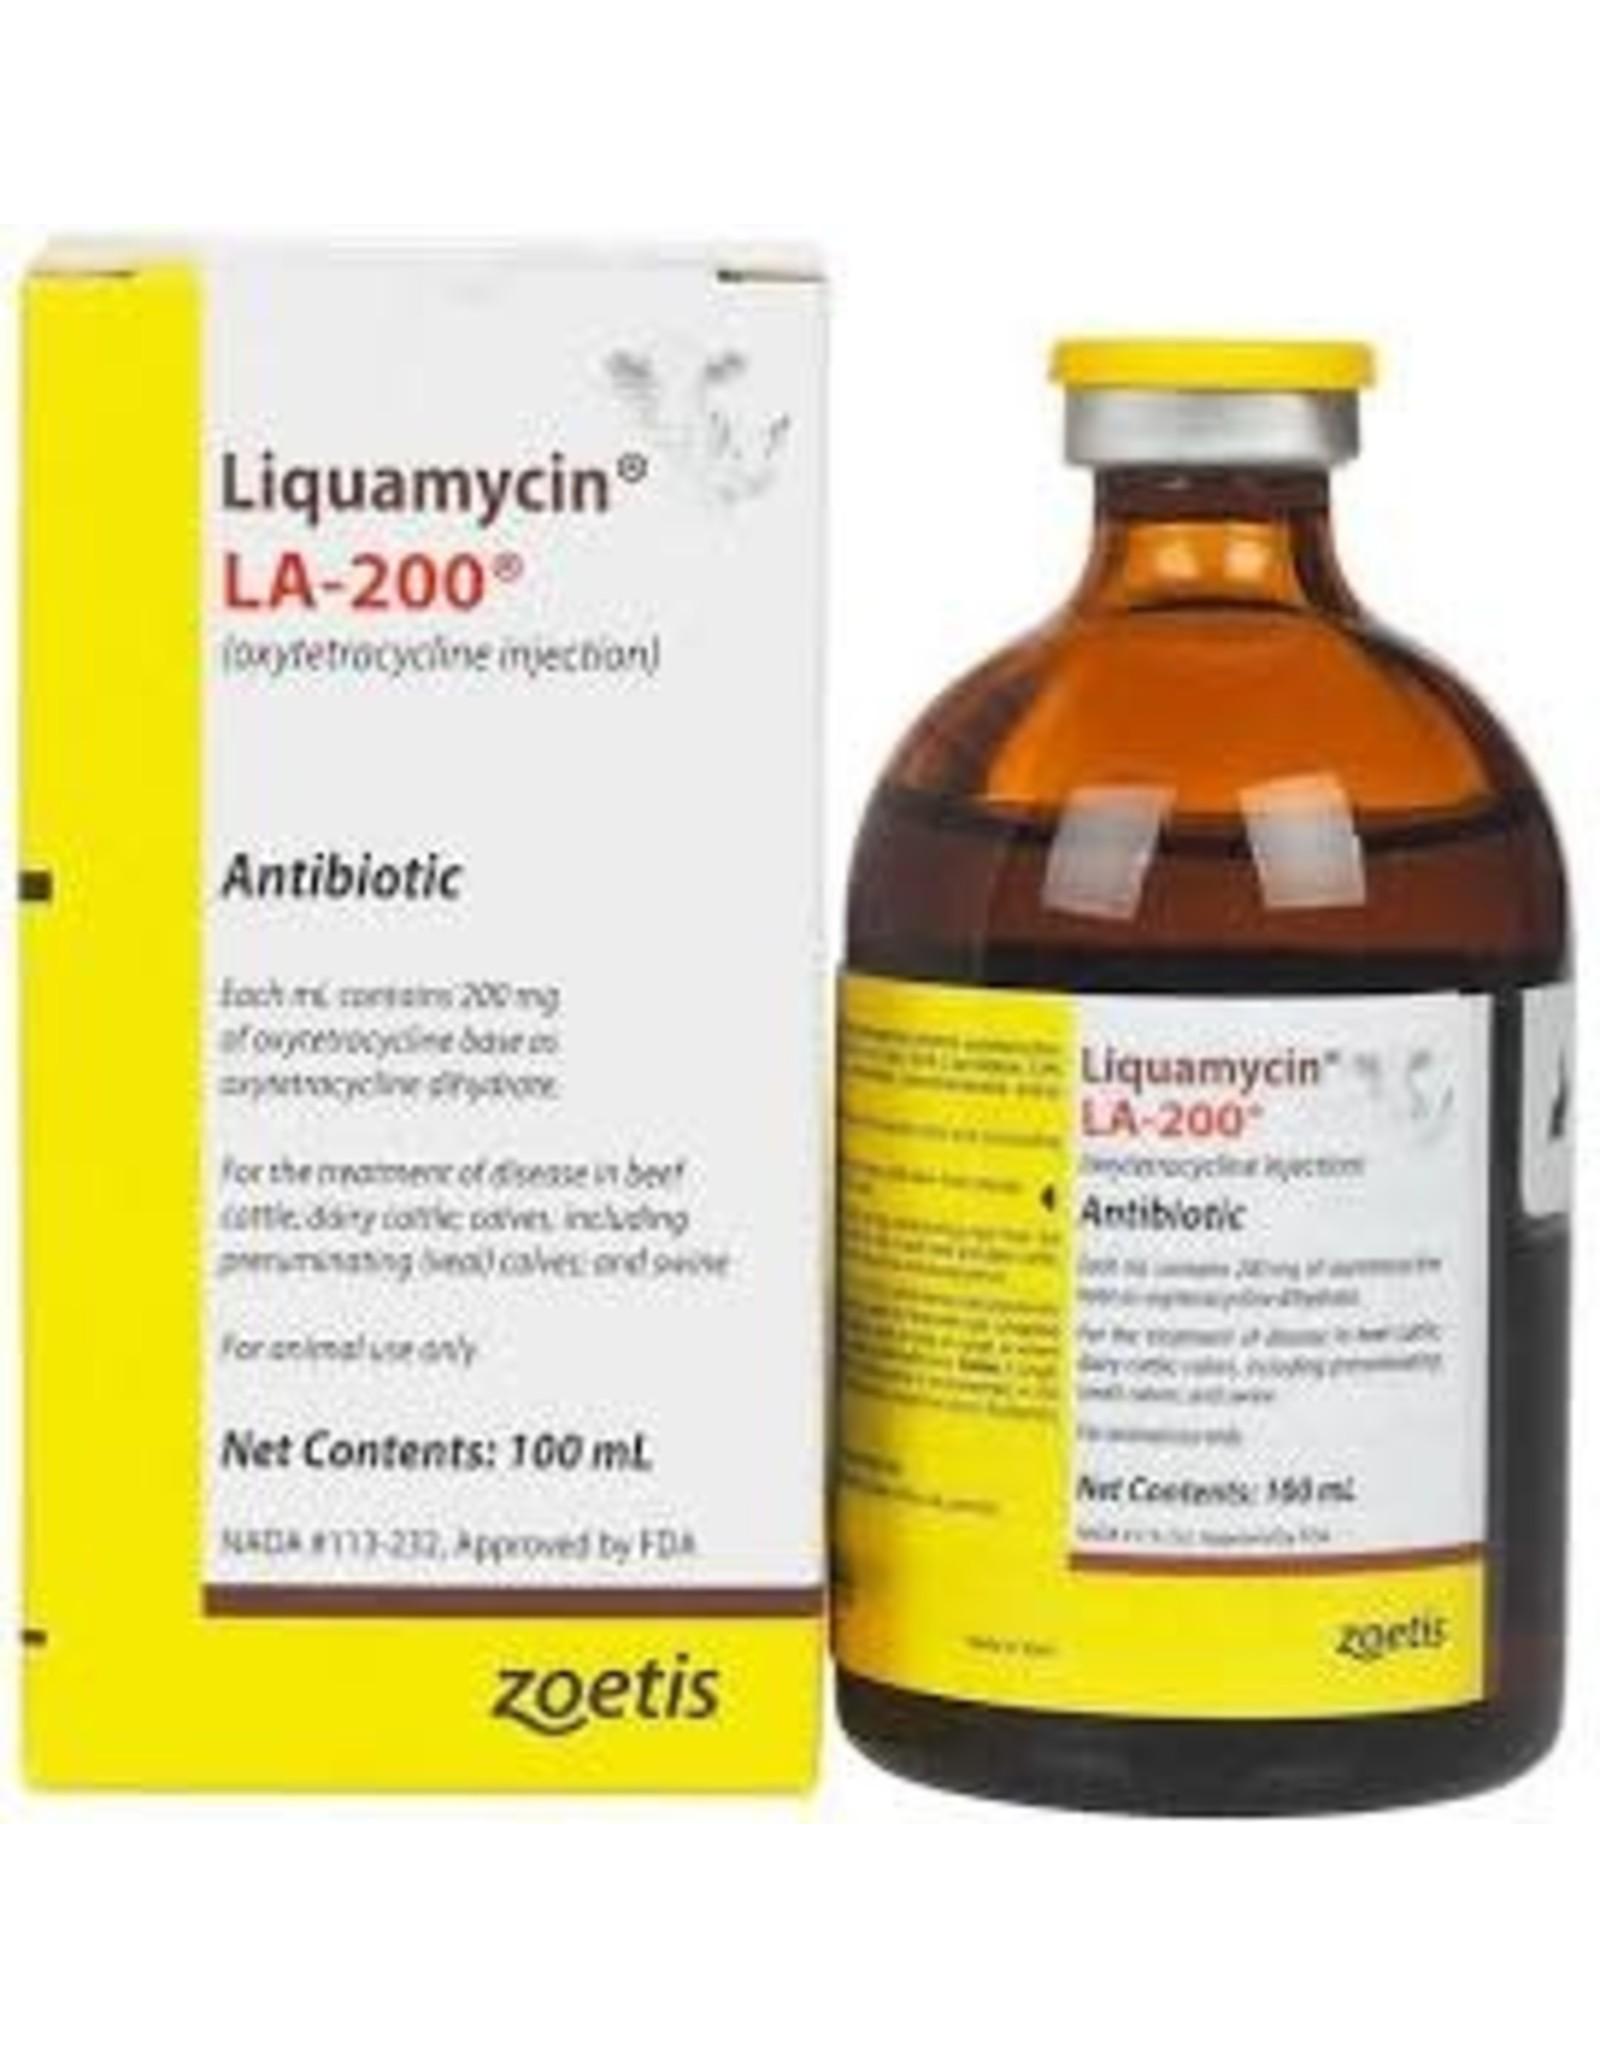 LA-200 Liquamycin Injectable Long Acting Antibiotic 100ml